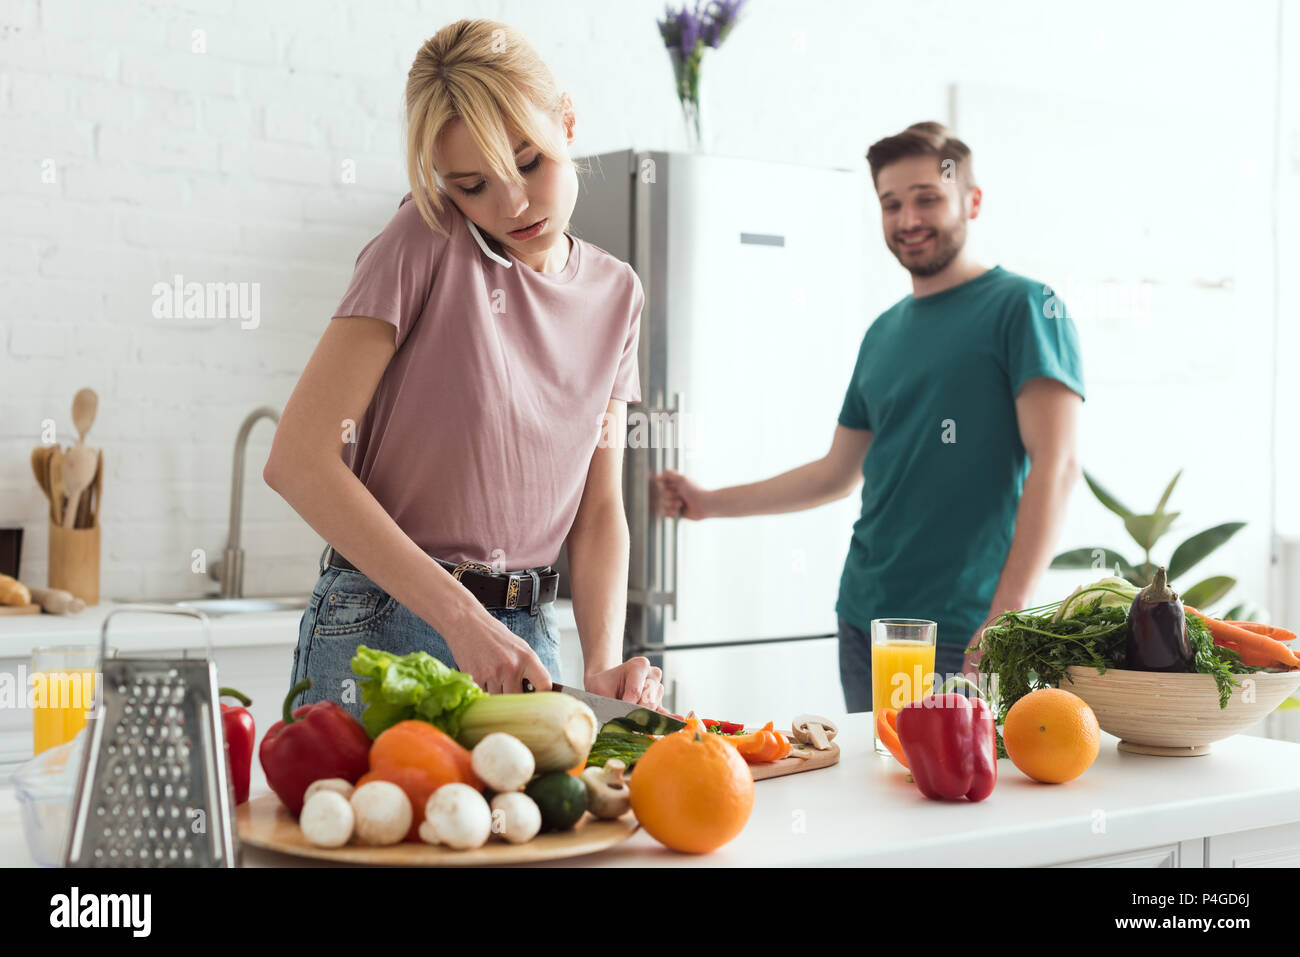 Vegan Freundin sprechen von Smartphone beim Kochen Salat an Küche Stockbild